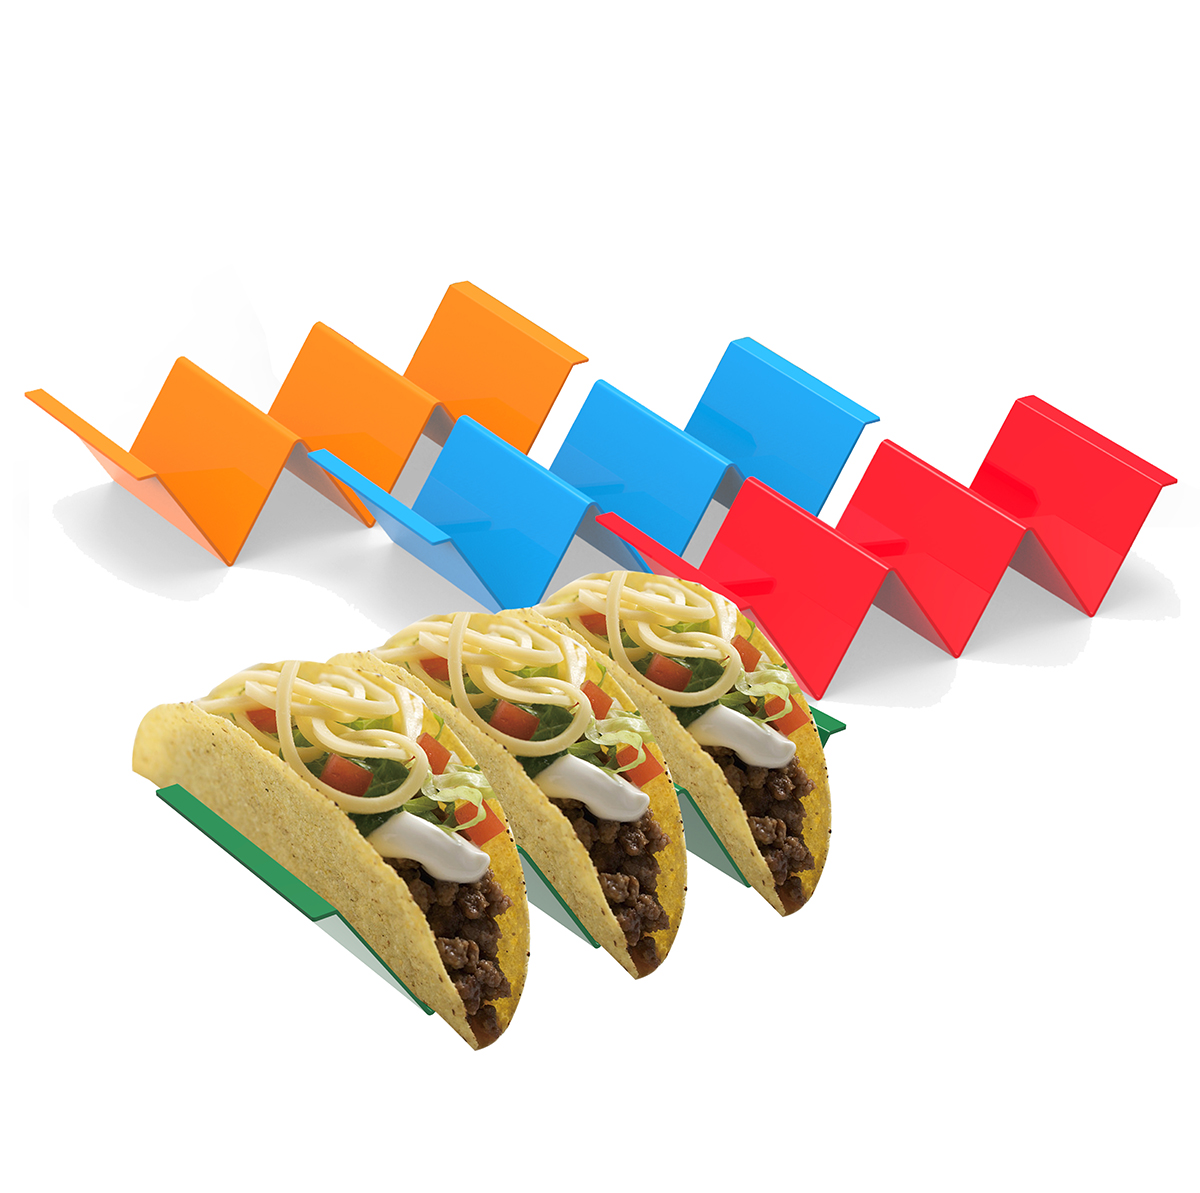 Food grade kunststoff taco trays stand Tablett spülmaschine und mikrowelle verfügbar taco halter